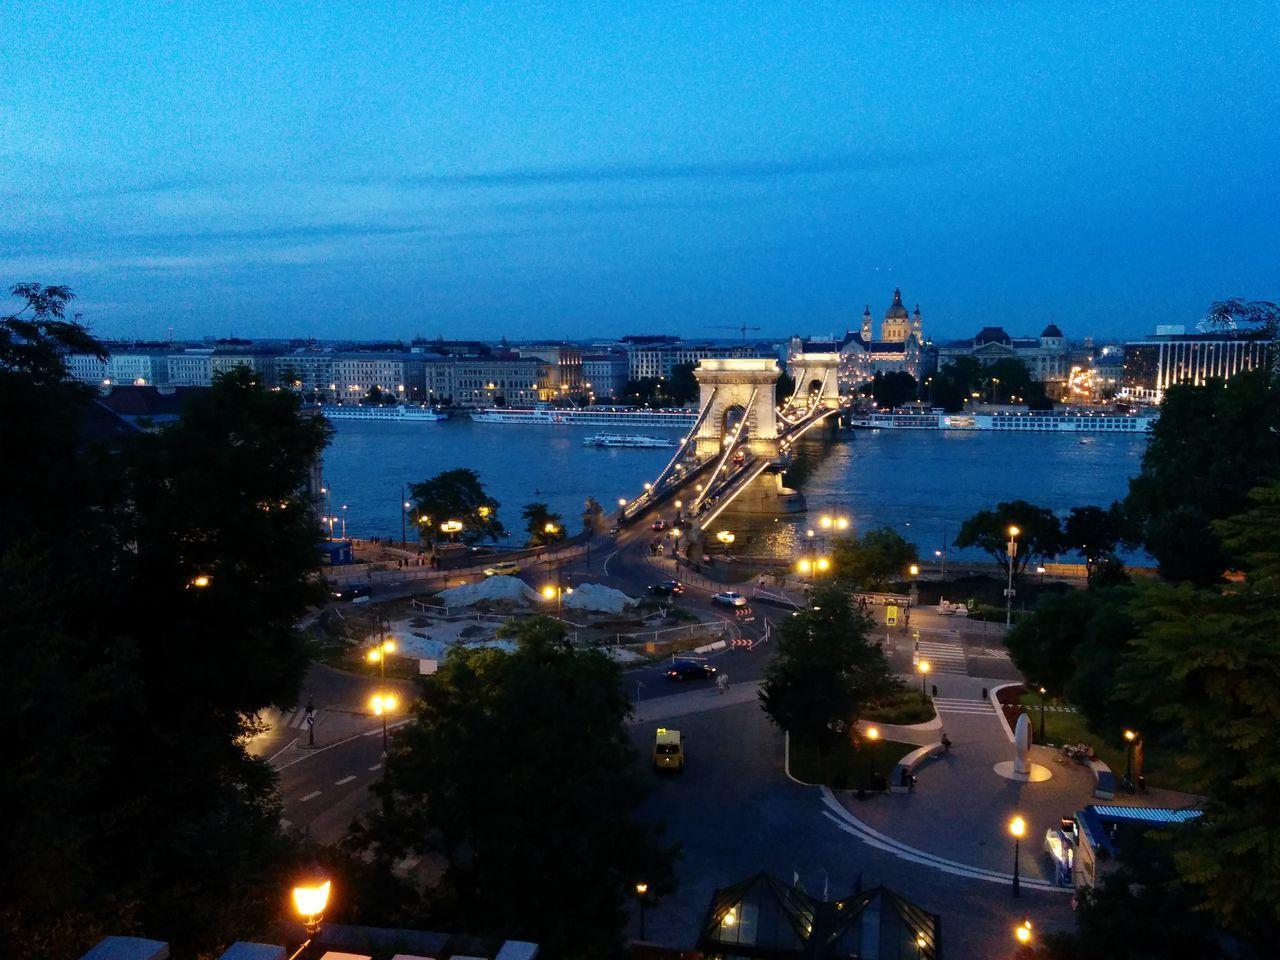 Illuminated Bridge Over River Against Blue Sky At Dusk